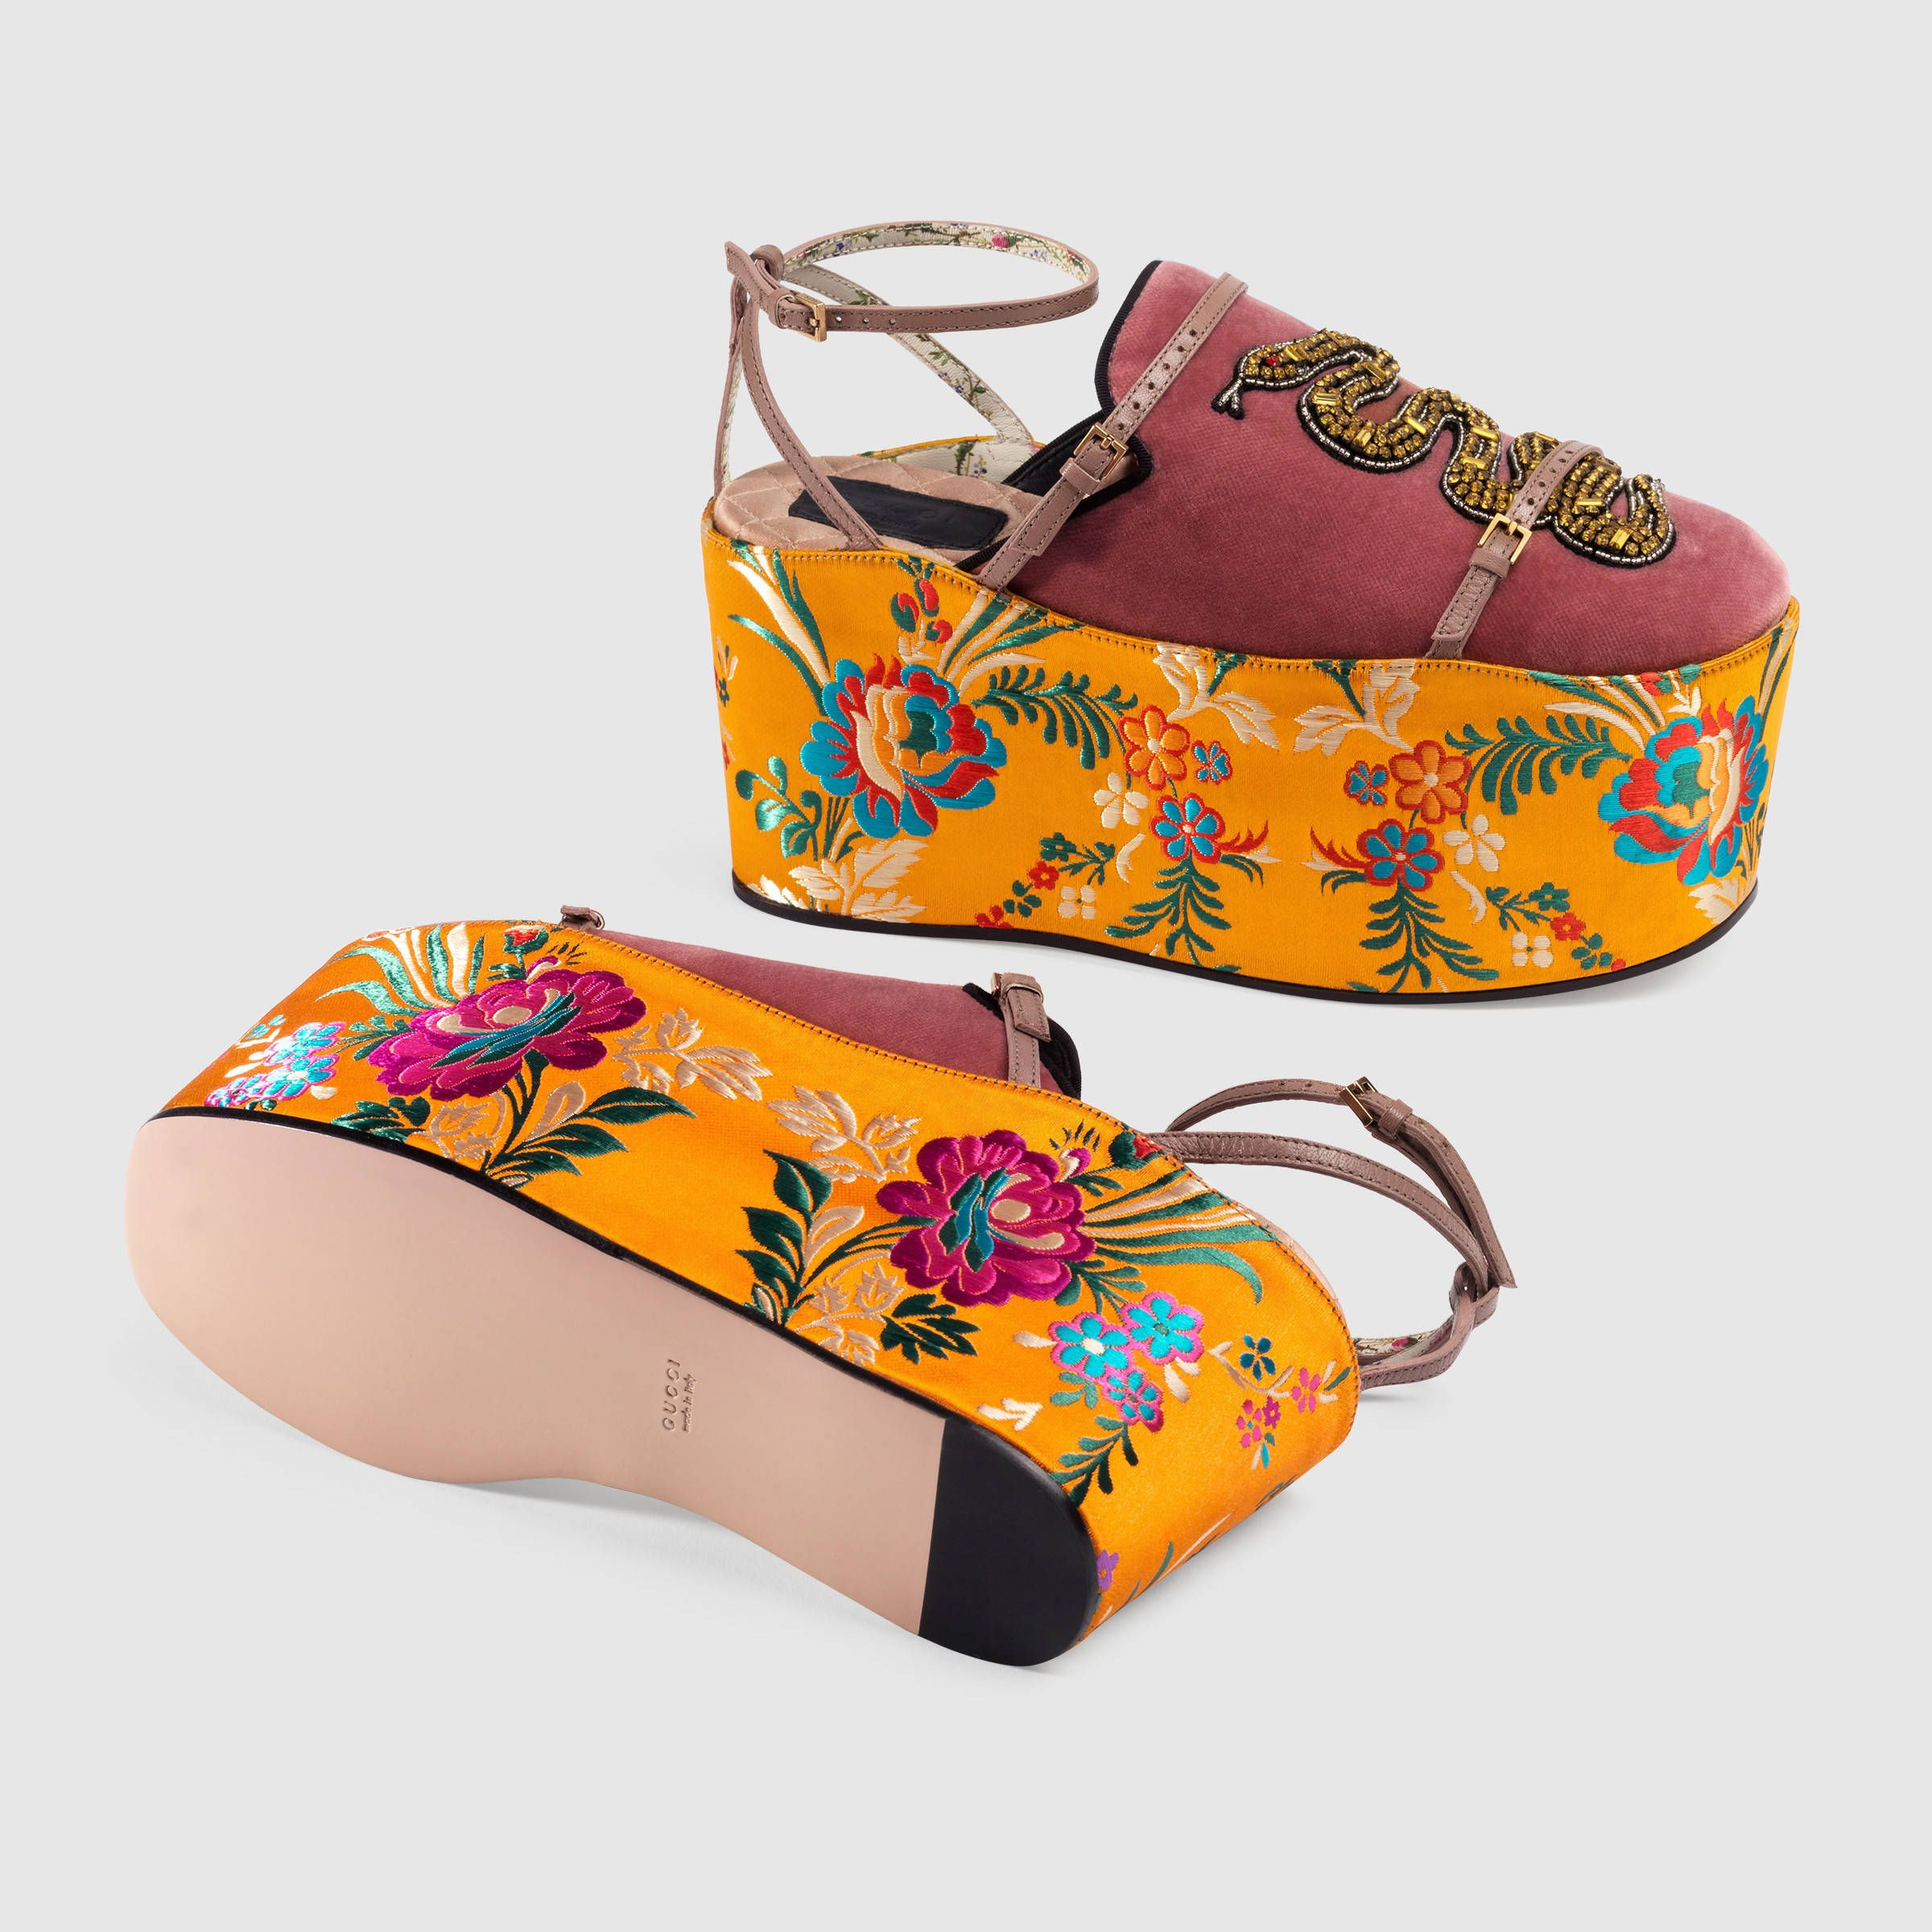 9a030dbcb91 Gucci Velvet slipper with removable platform Detail 6